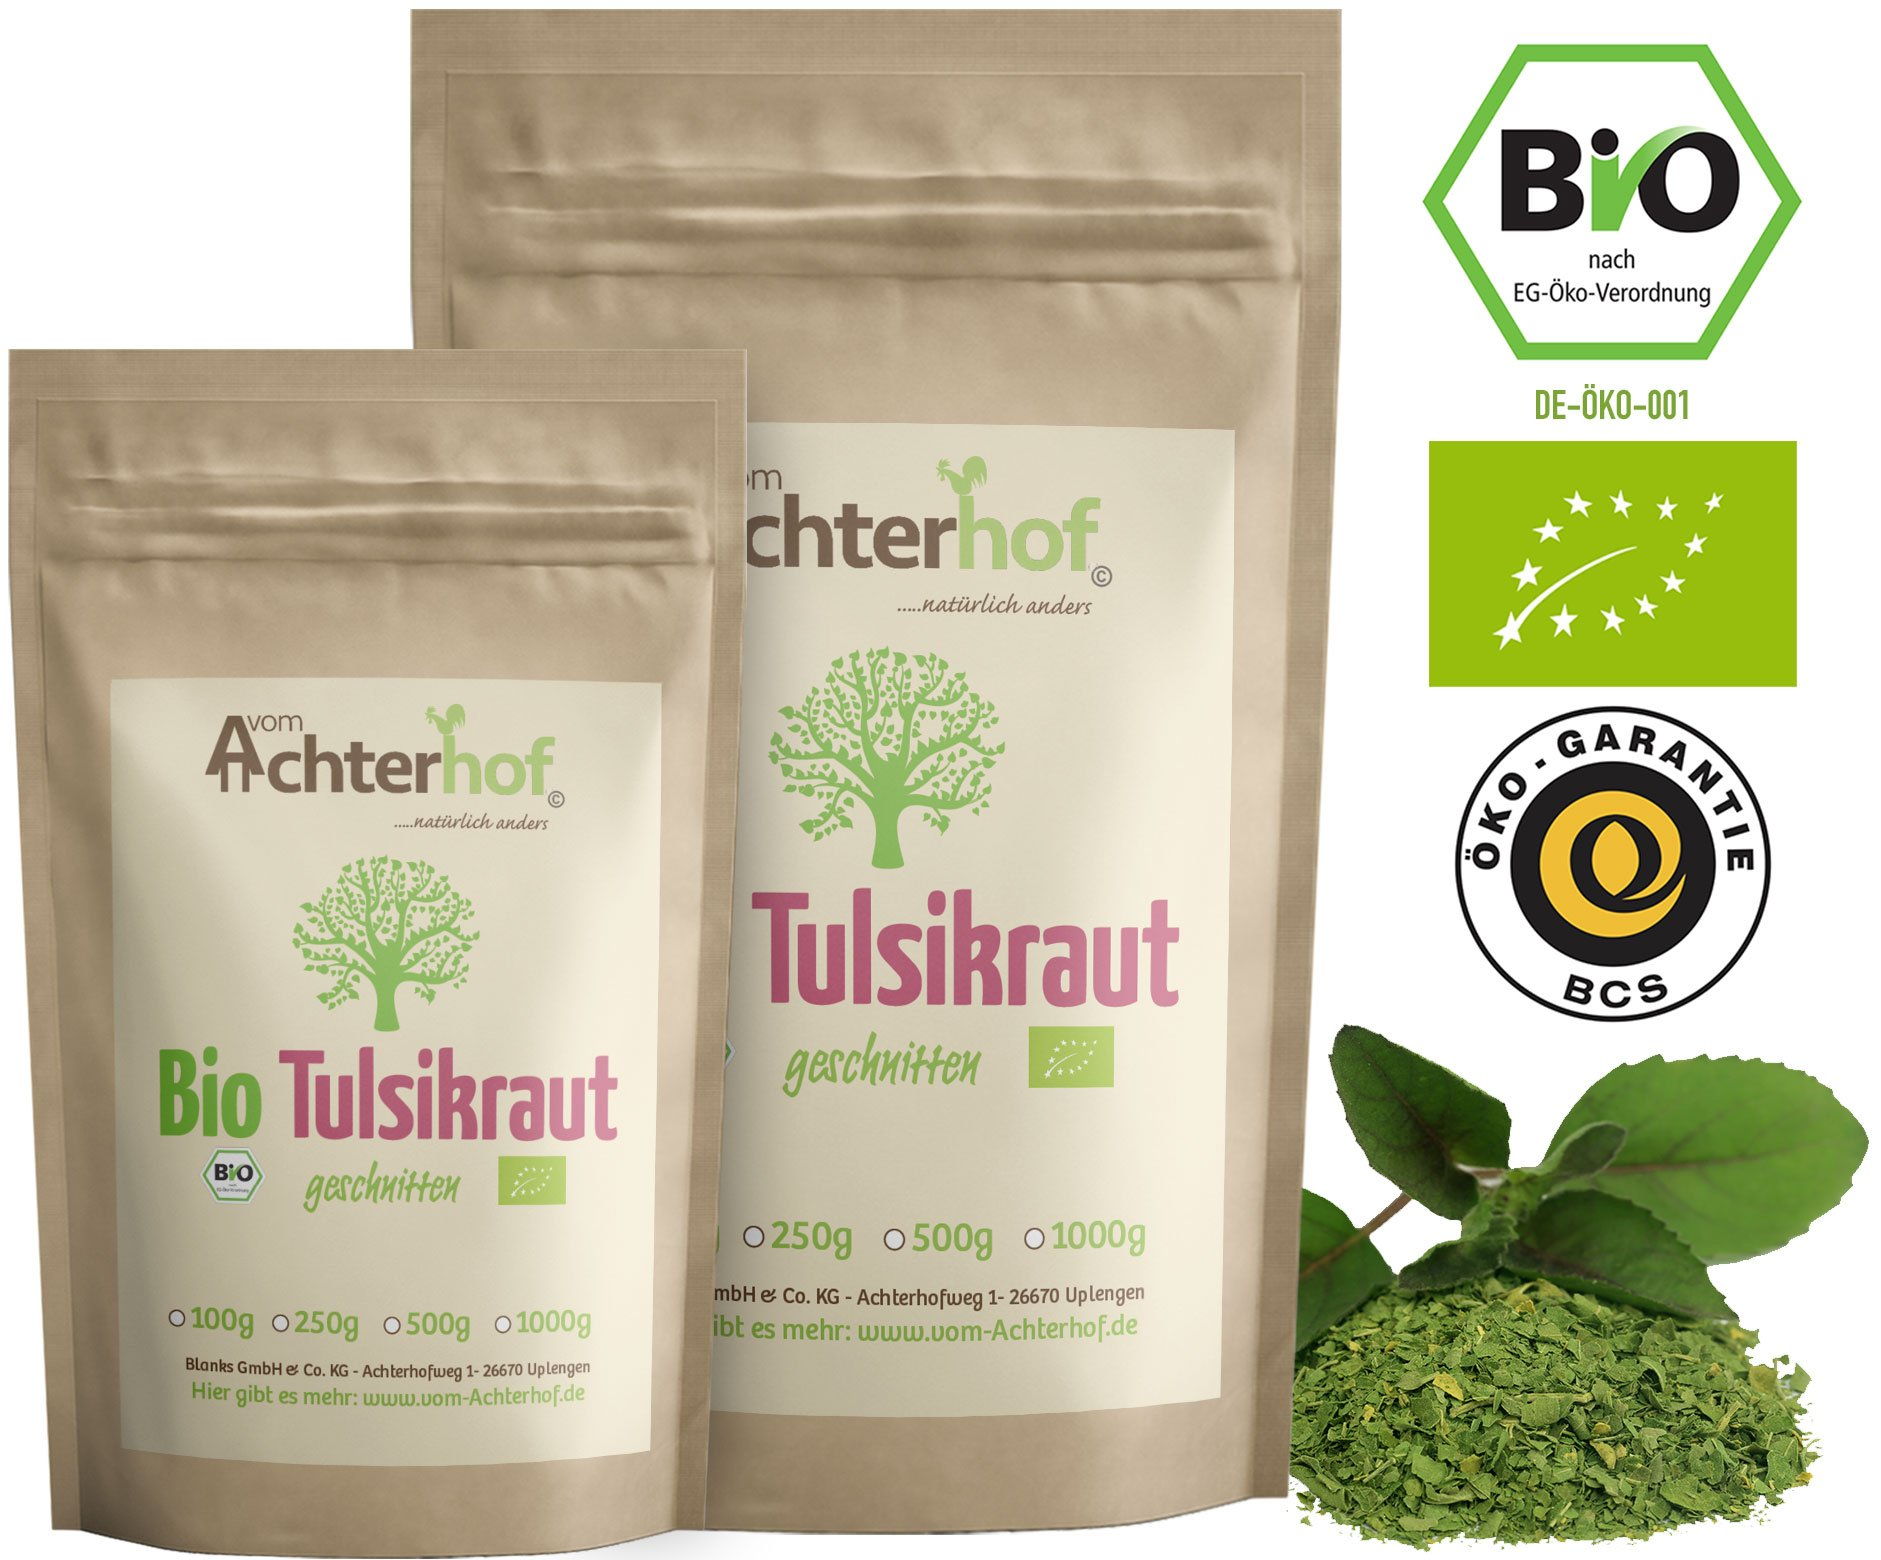 Tulsi-Tee-Bio-100g-Tulsikraut-gerebelt-indischer-Basilikum